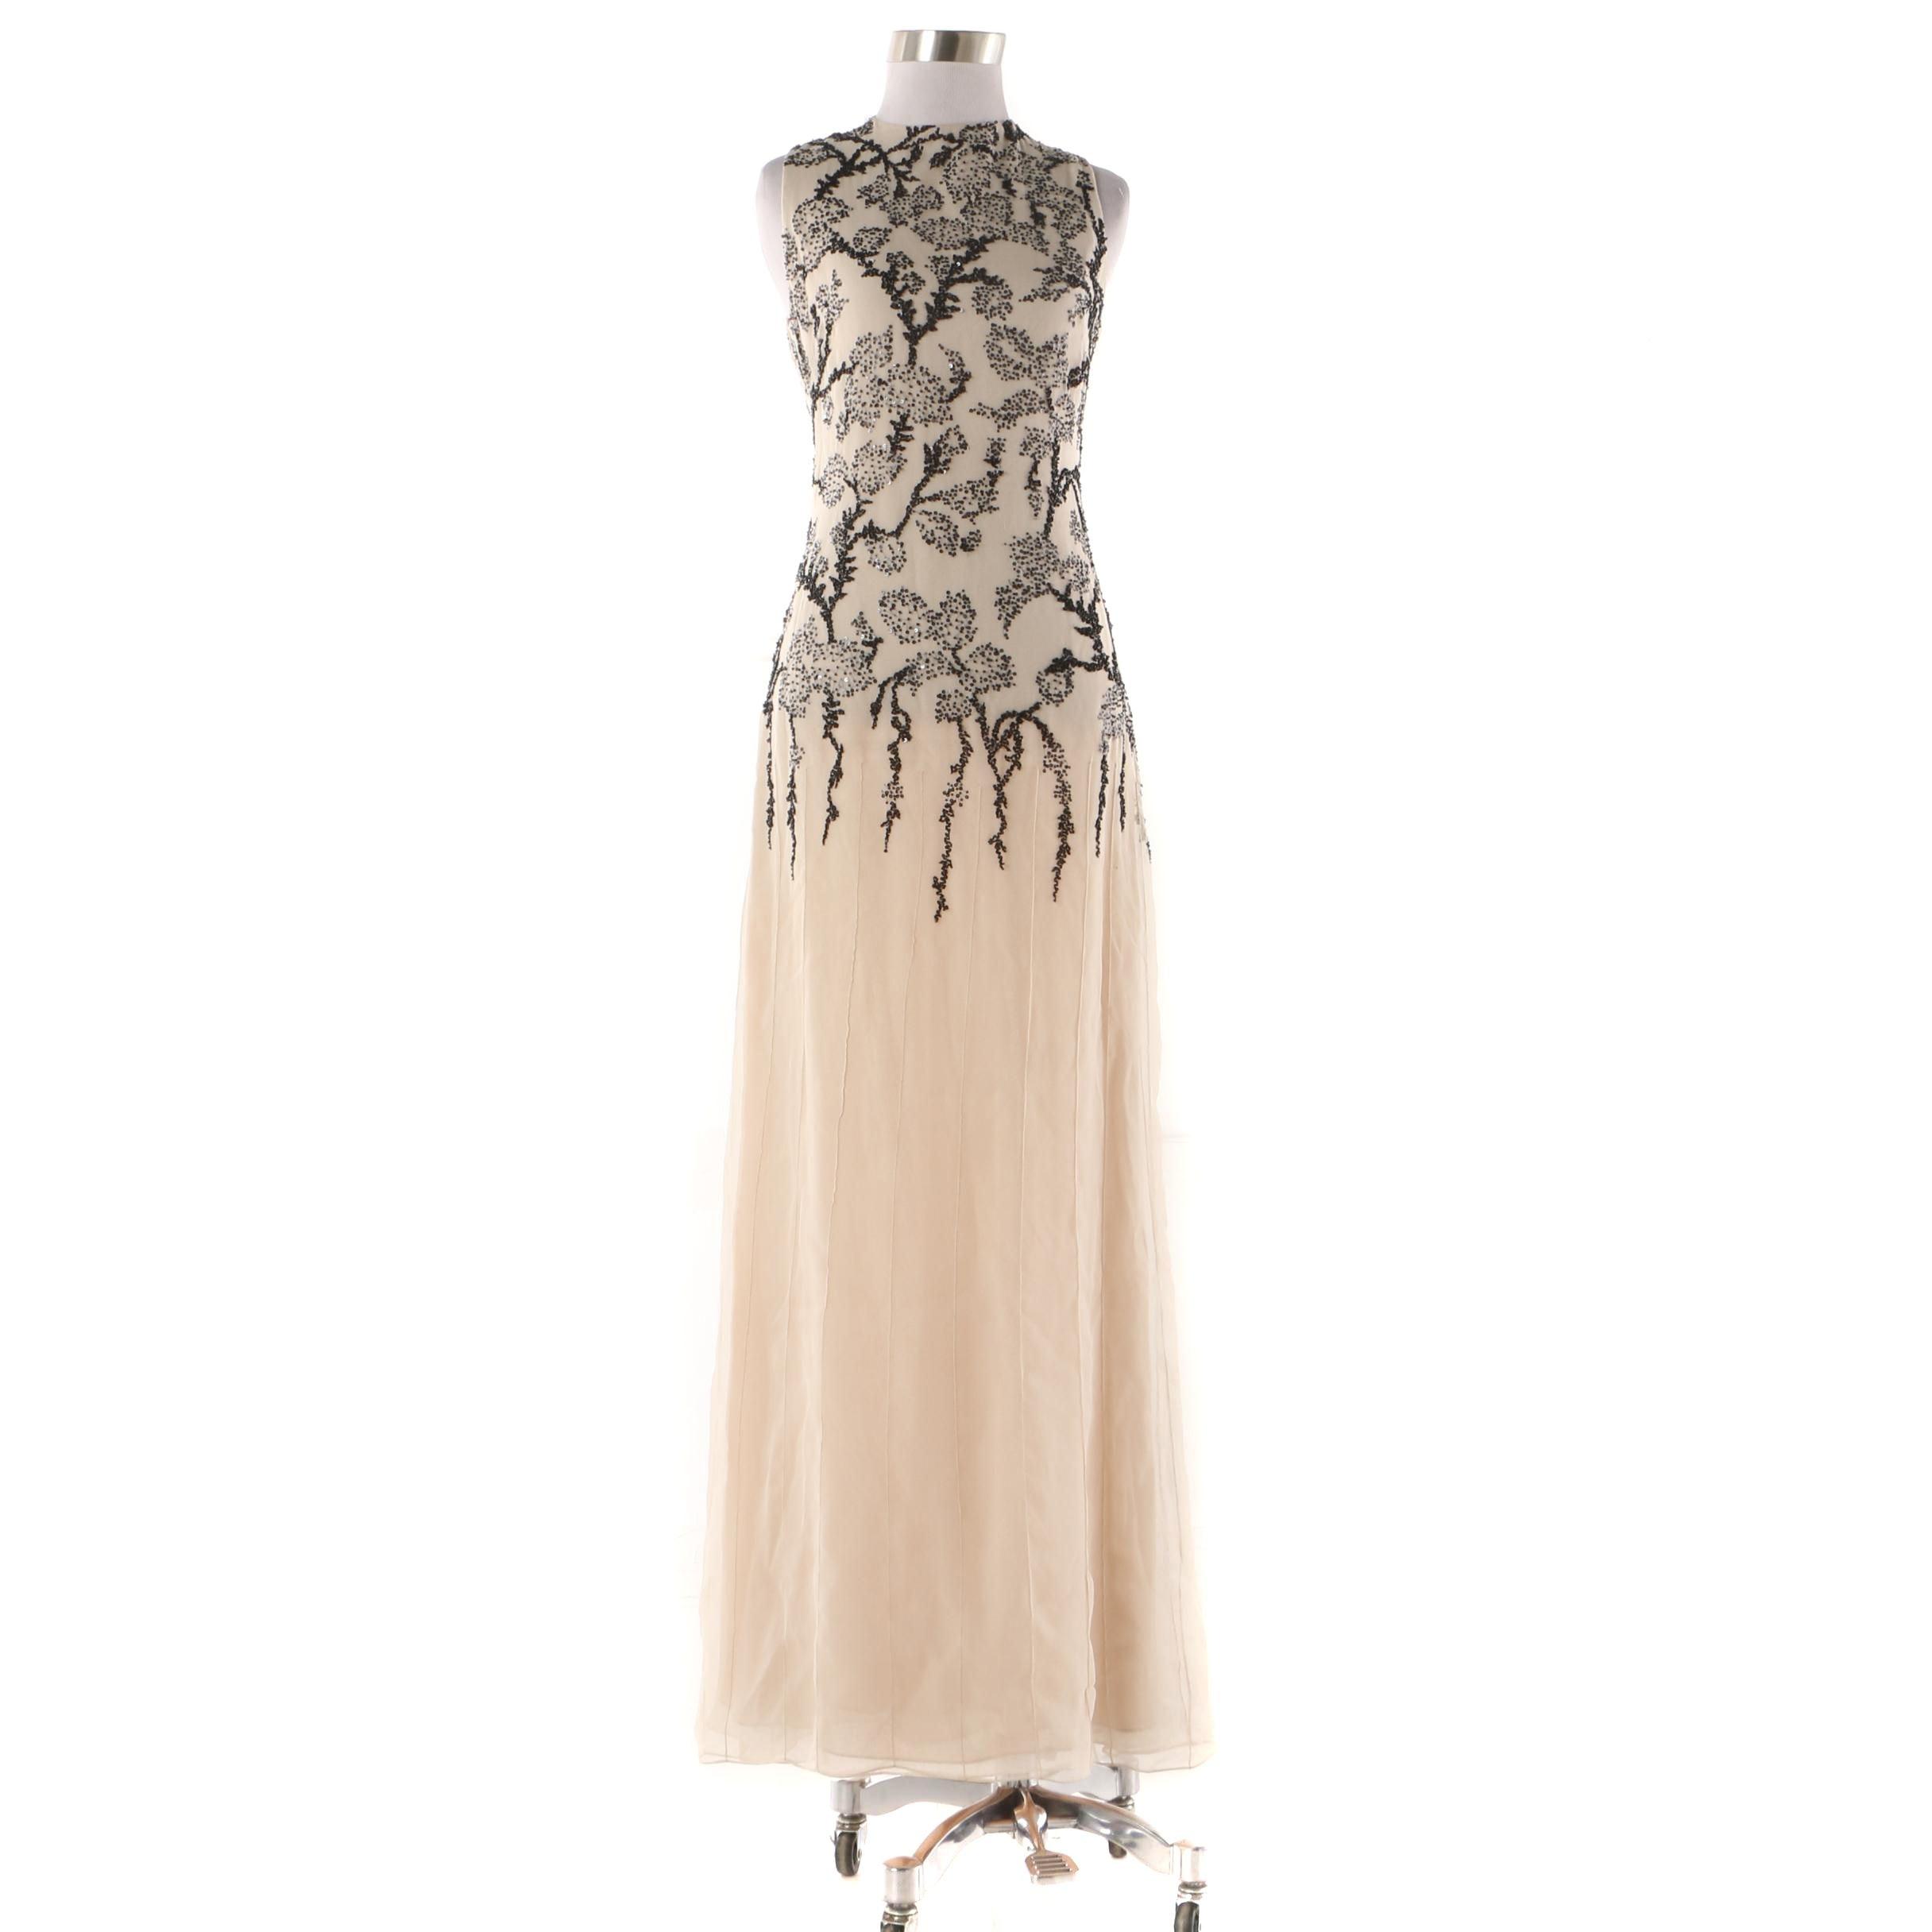 Vera Wang Champagne Silk Sleeveless Evening Dress with Black Foliate Beading